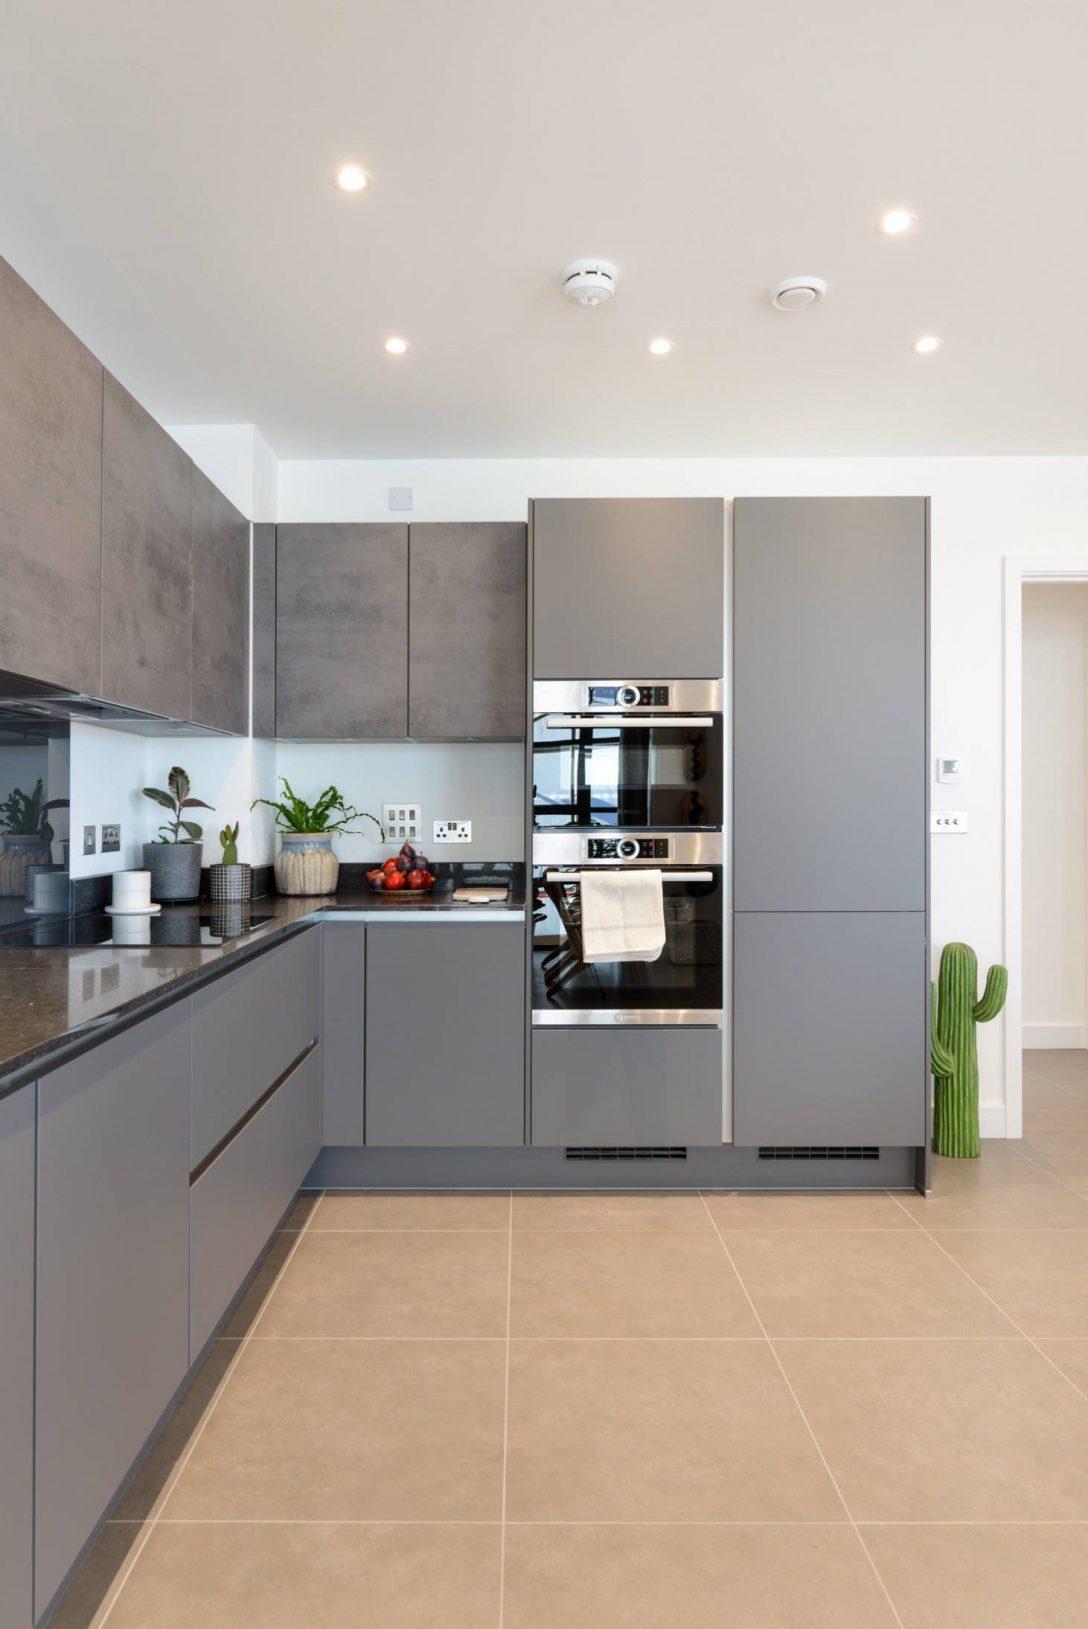 Large Size of Küche Blende Grau Sockelblende Küche Demontieren Küche Blende Geschirrspüler Entfernen Küche Mit Blende Küche Küche Blende